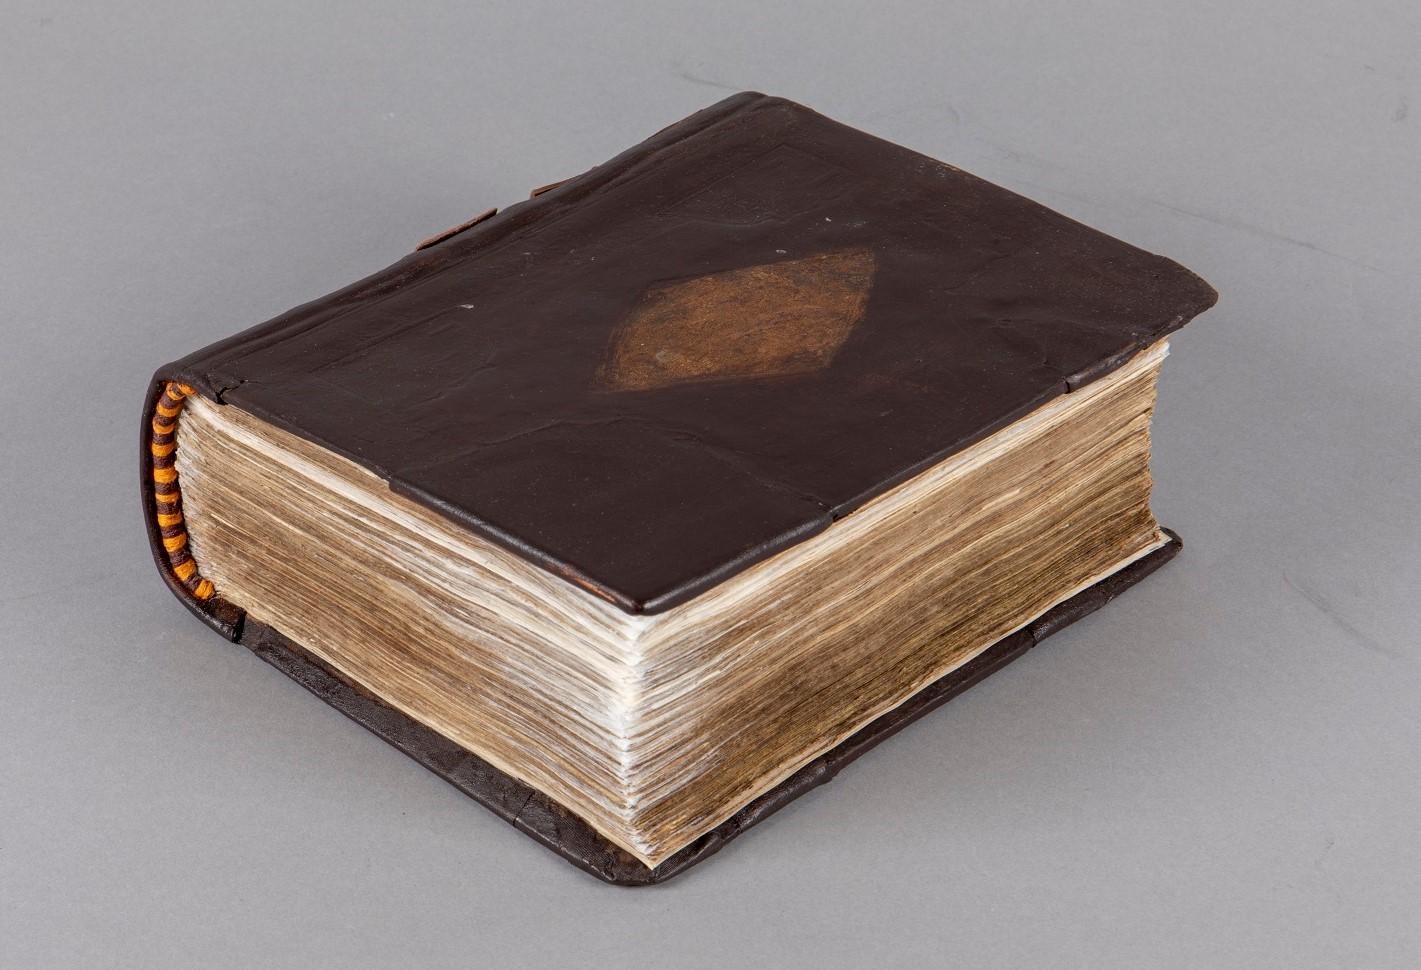 Slujebnic (Liturghier), 1681